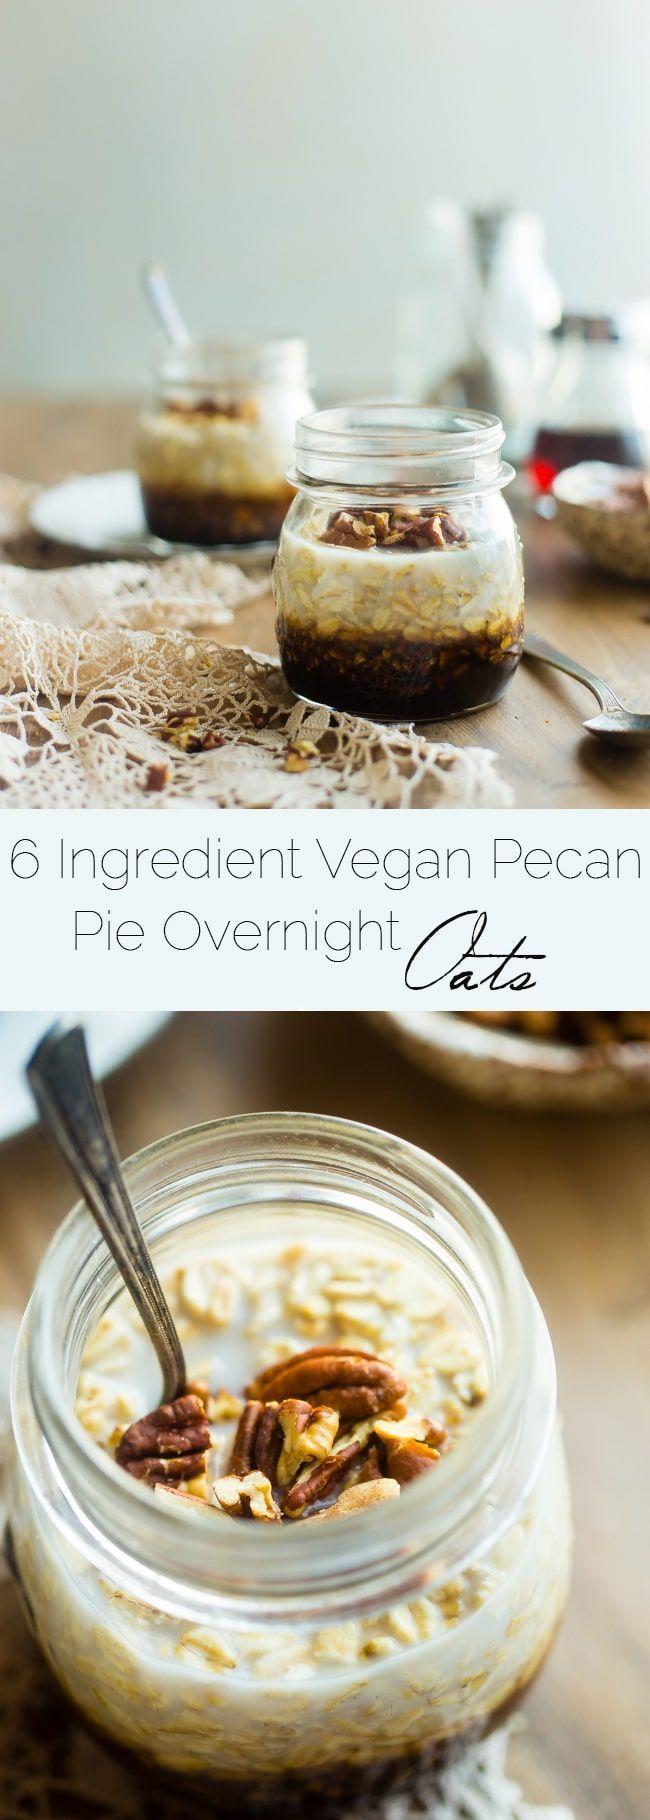 6 Ingredient Vegan Pecan Pie Overnight Oats - These healthy overnight oats taste like pecan pie! They're a 10 minute, gluten free make-ahead breakfast with only 6 ingredients that tastes like dessert!   Foodfaithfitness.com   @FoodFaithFit